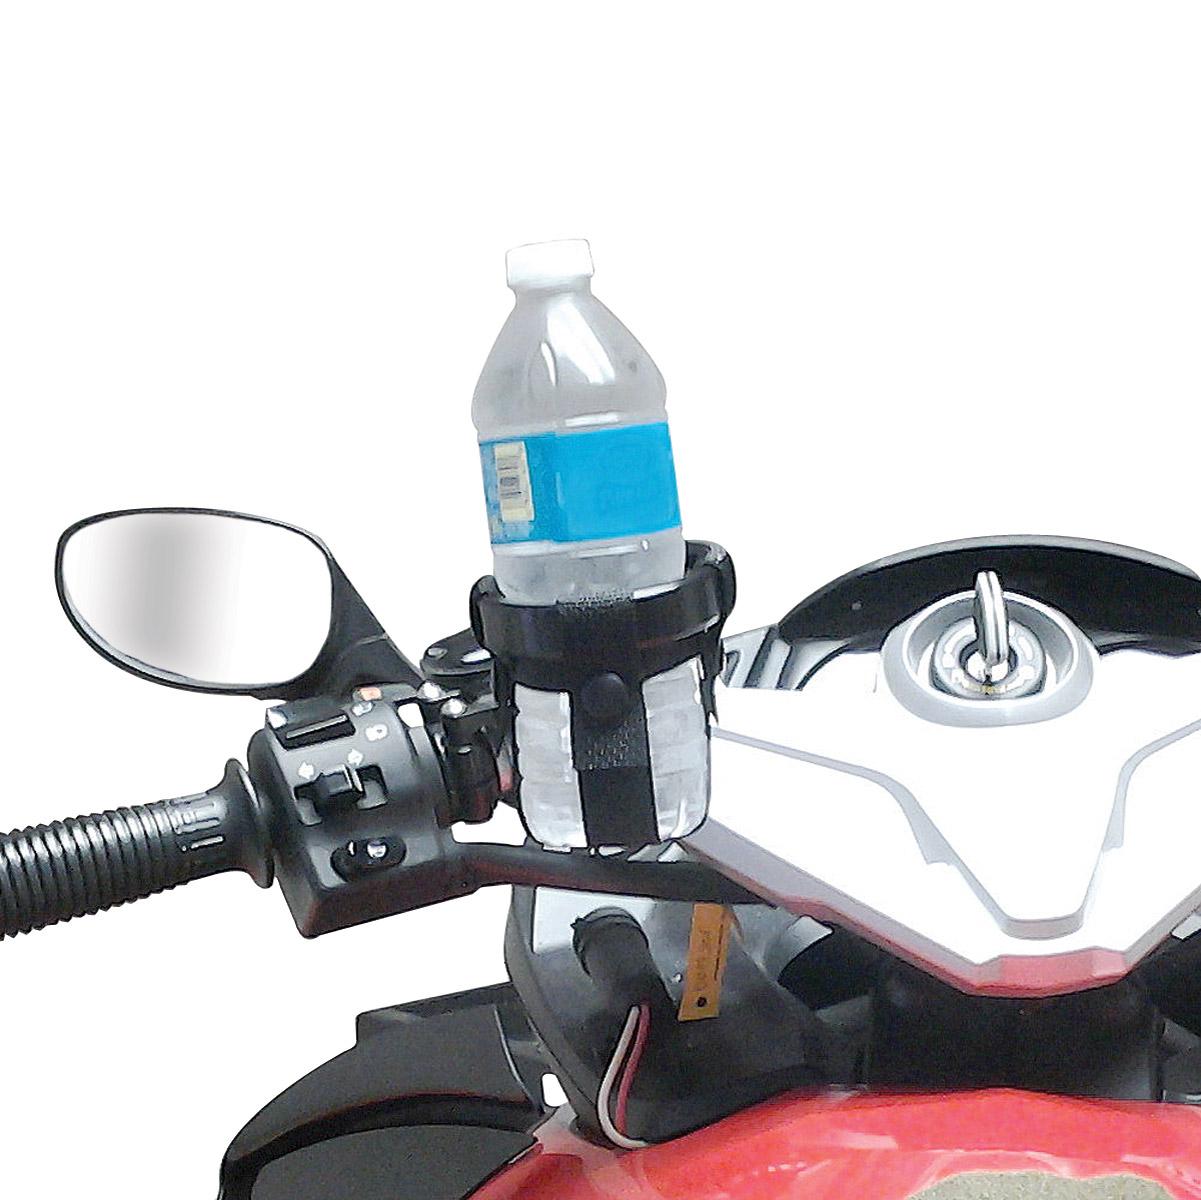 Leader Roadrunner Drink Holder with Ultra-Snap Insert